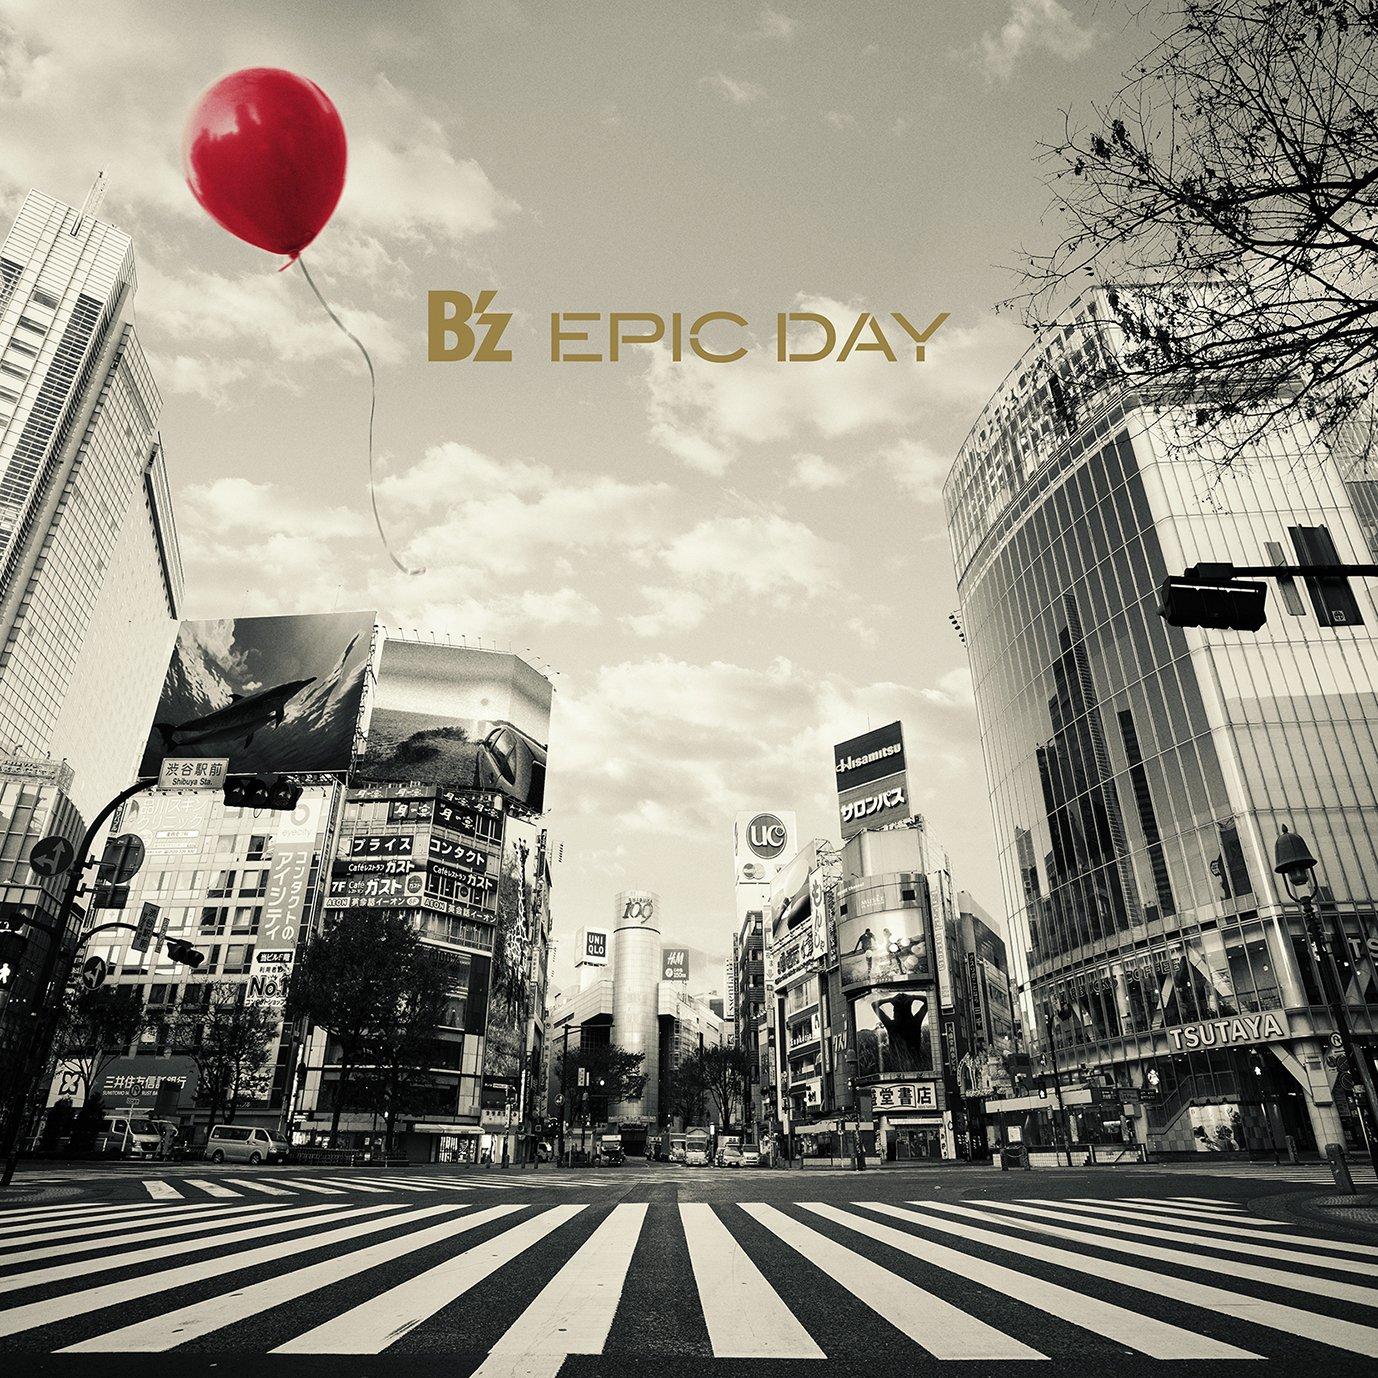 EPIC DAY (初回限定盤)(DVD付) 【ロングボックス仕様】 B'z